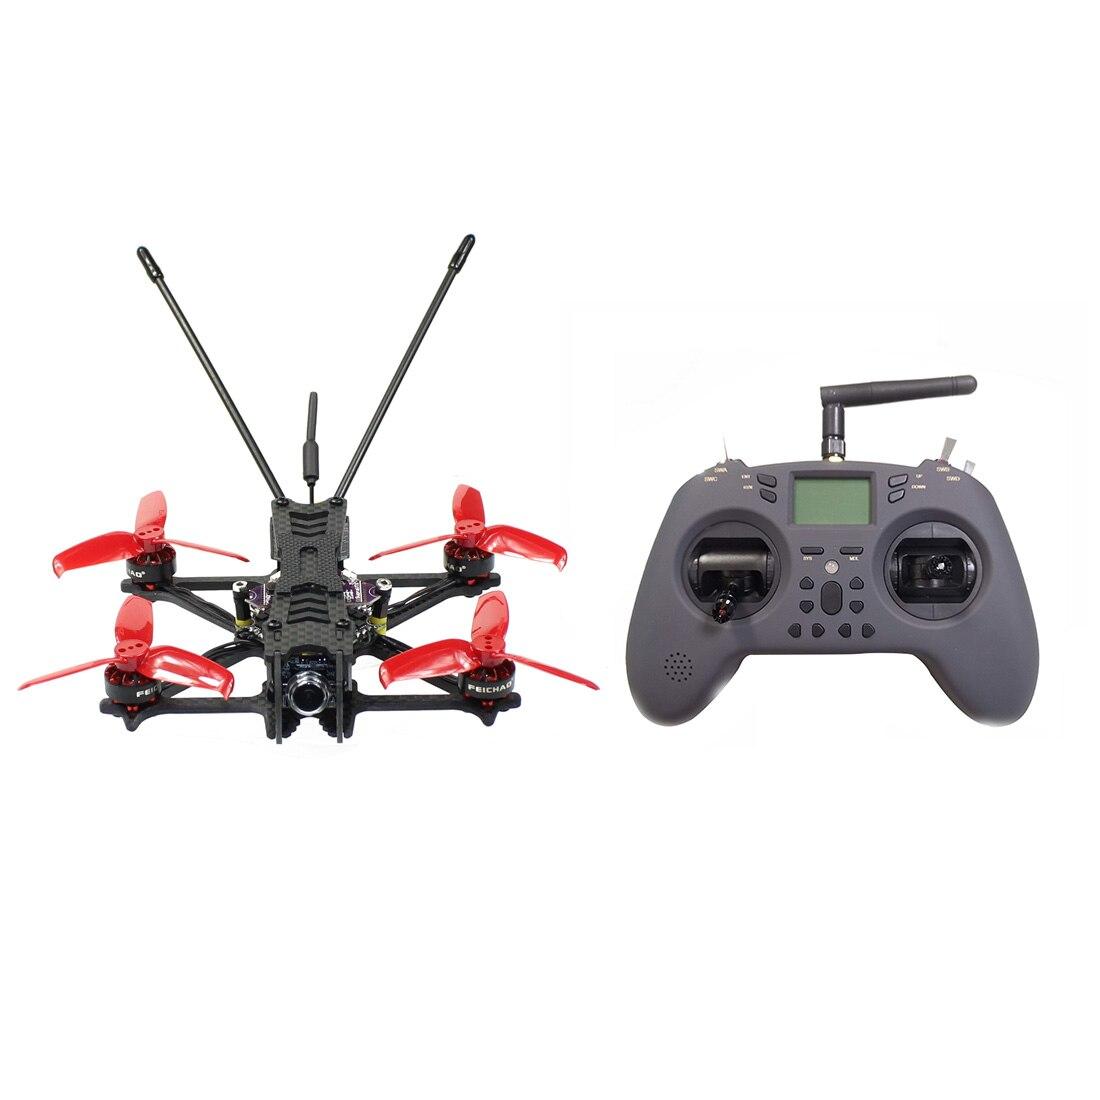 F115 FPV سباق داخلي DIY Drone كيت F411 20A AIO 2S-5S BLHELI _ S الطيران المراقب 1204 5000kv المحرك T-LITE عن تحكم